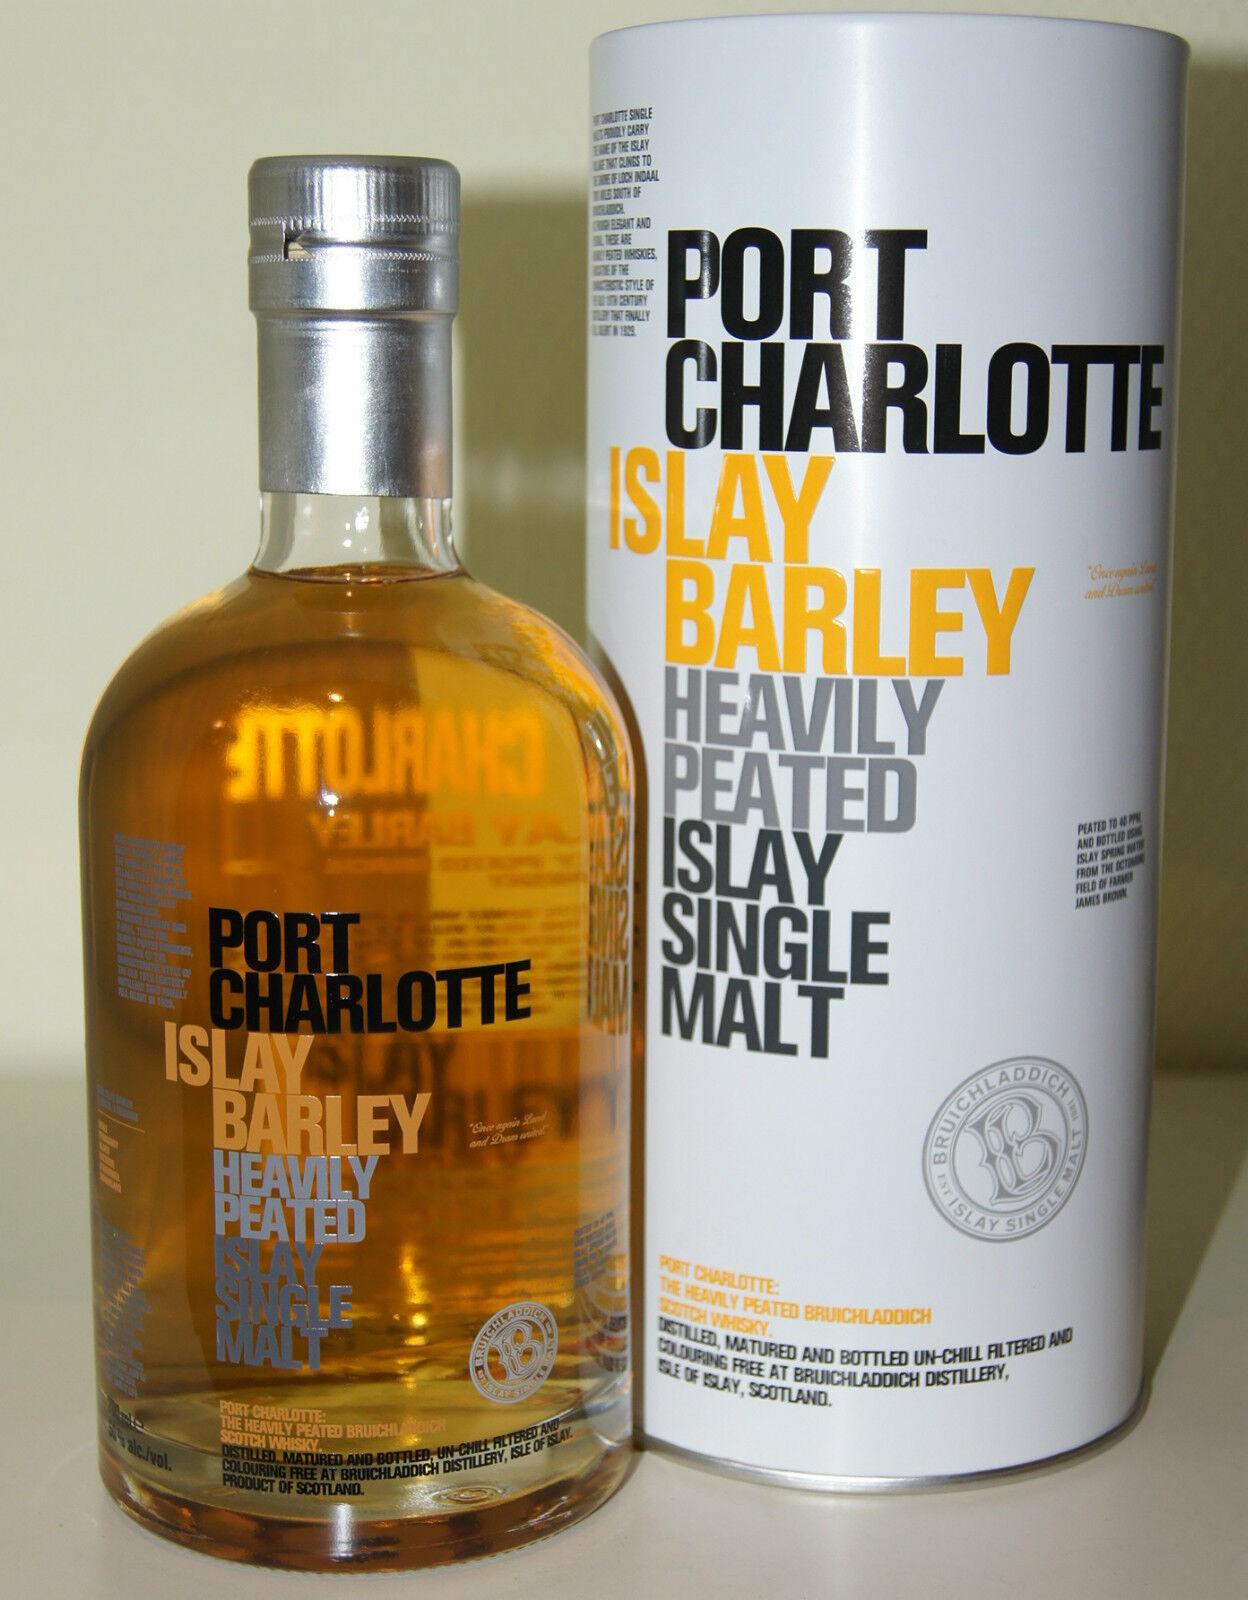 Port charlotte 50 islay barley heavily peated 40 ppm - Bruichladdich port charlotte heavily peated ...